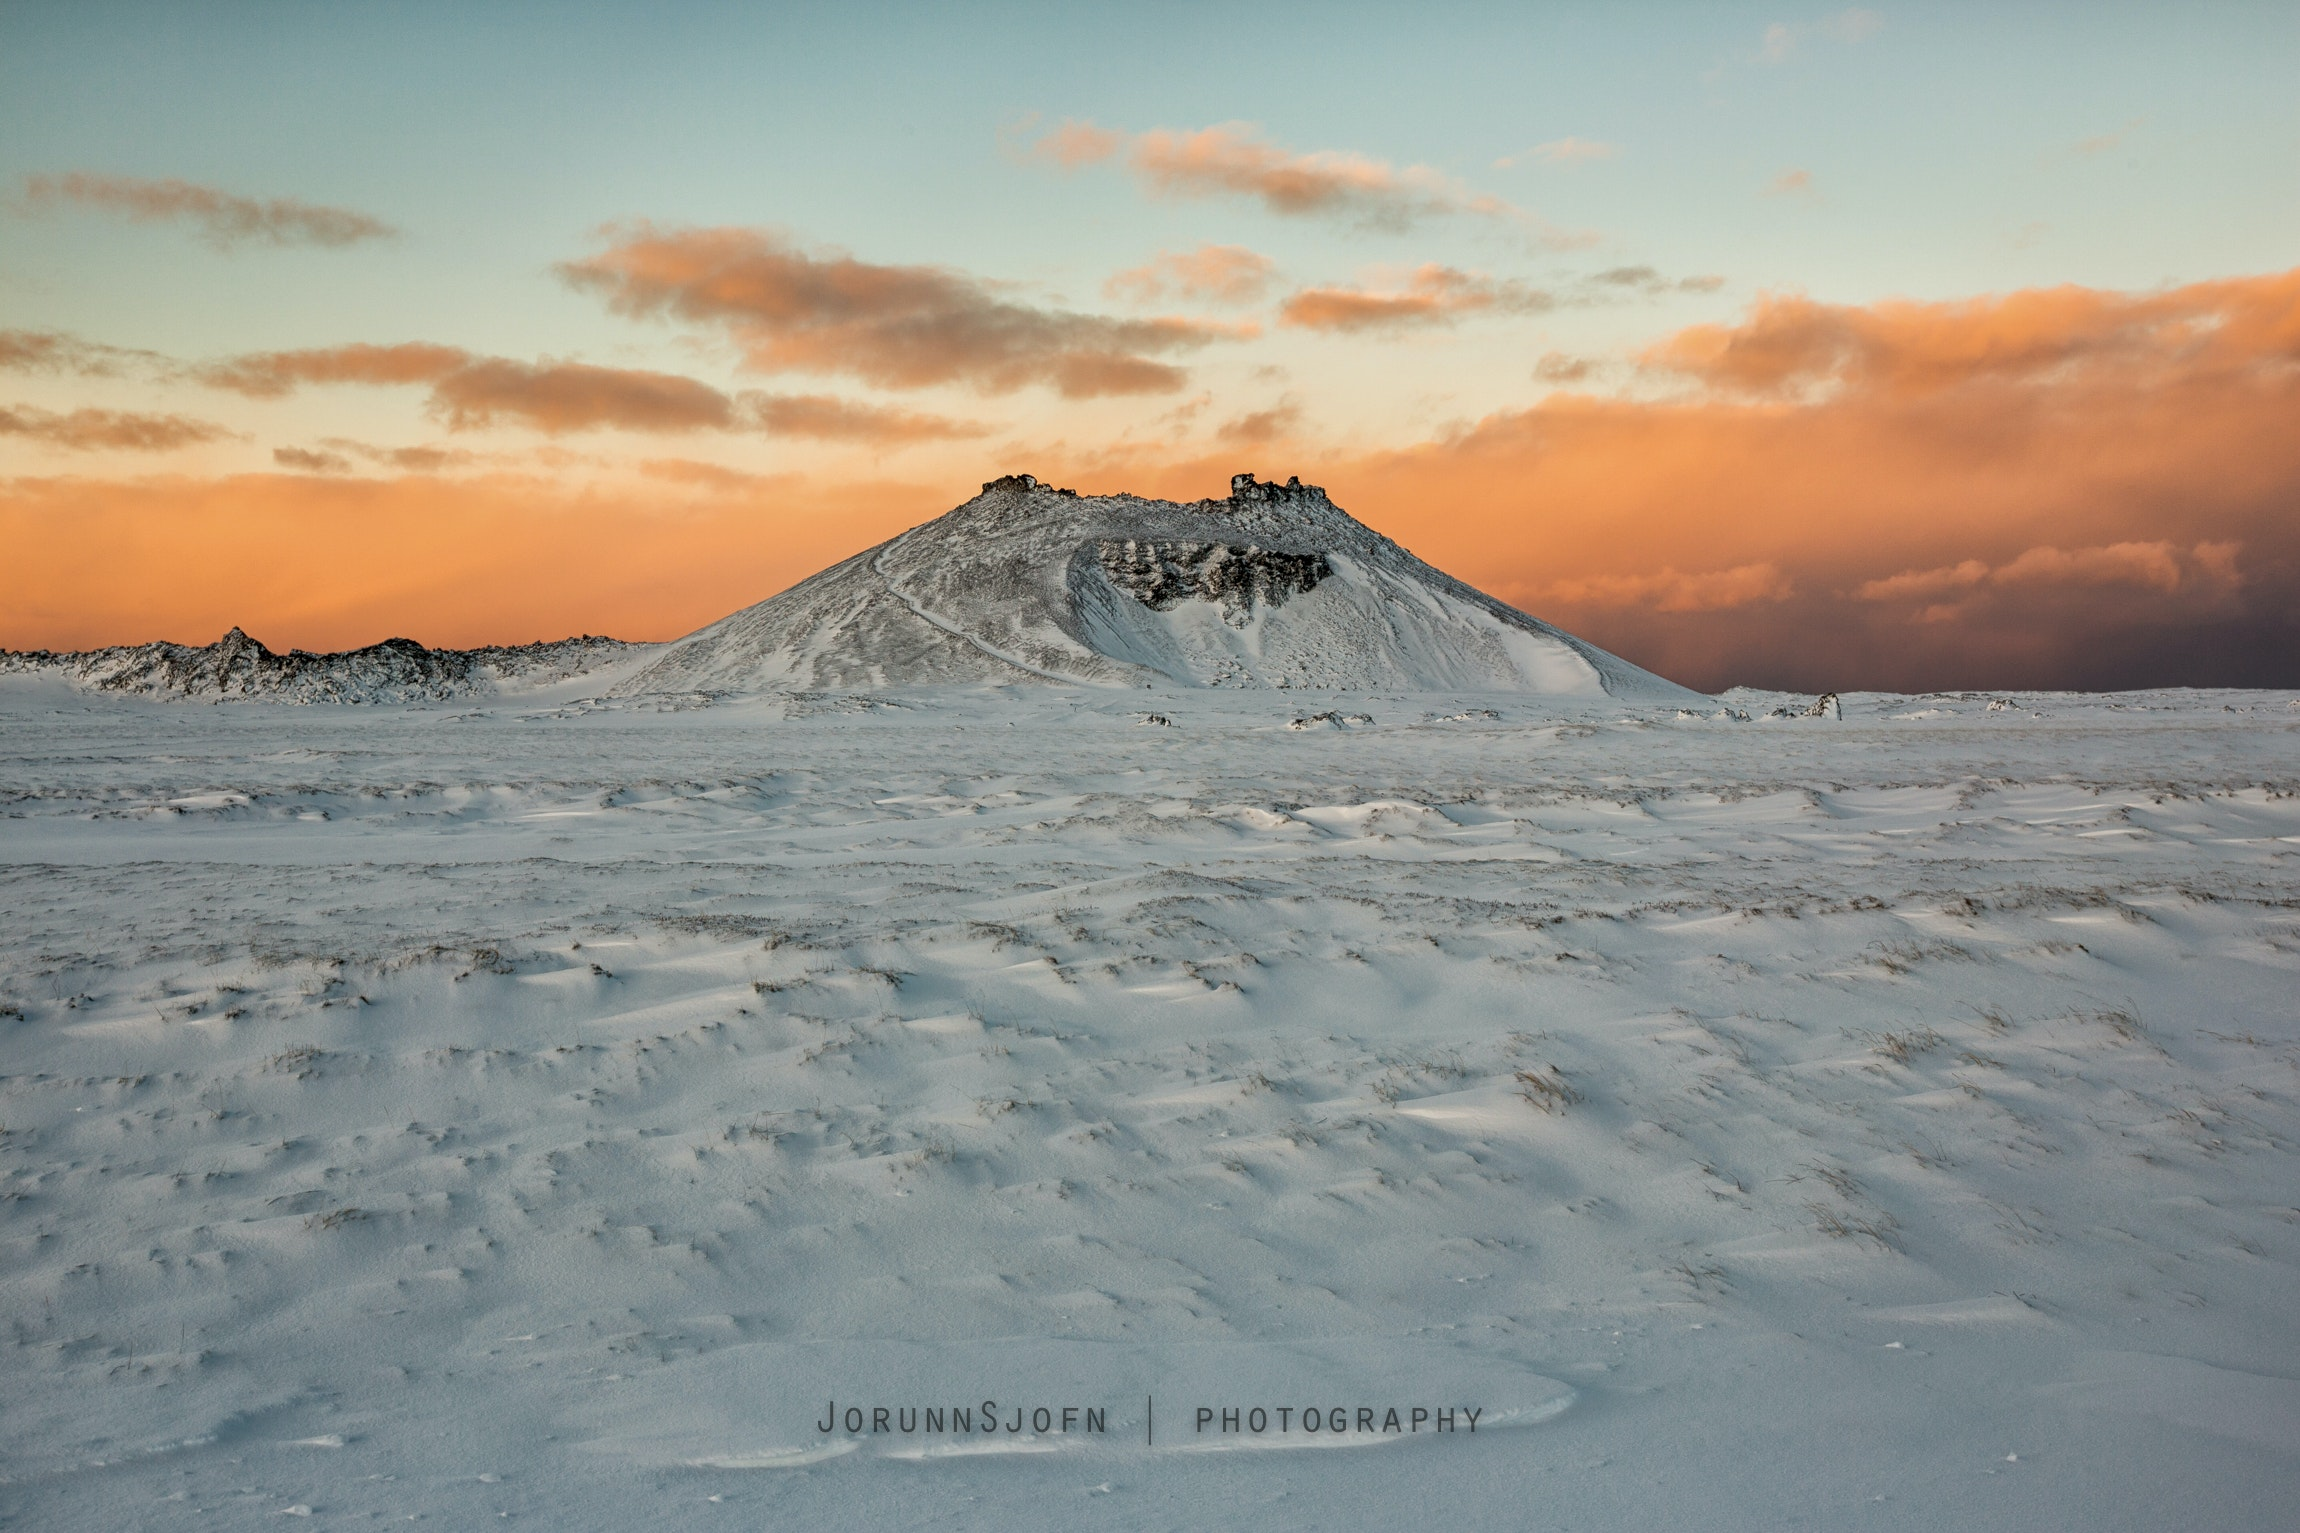 Snow on Grábrók Crater